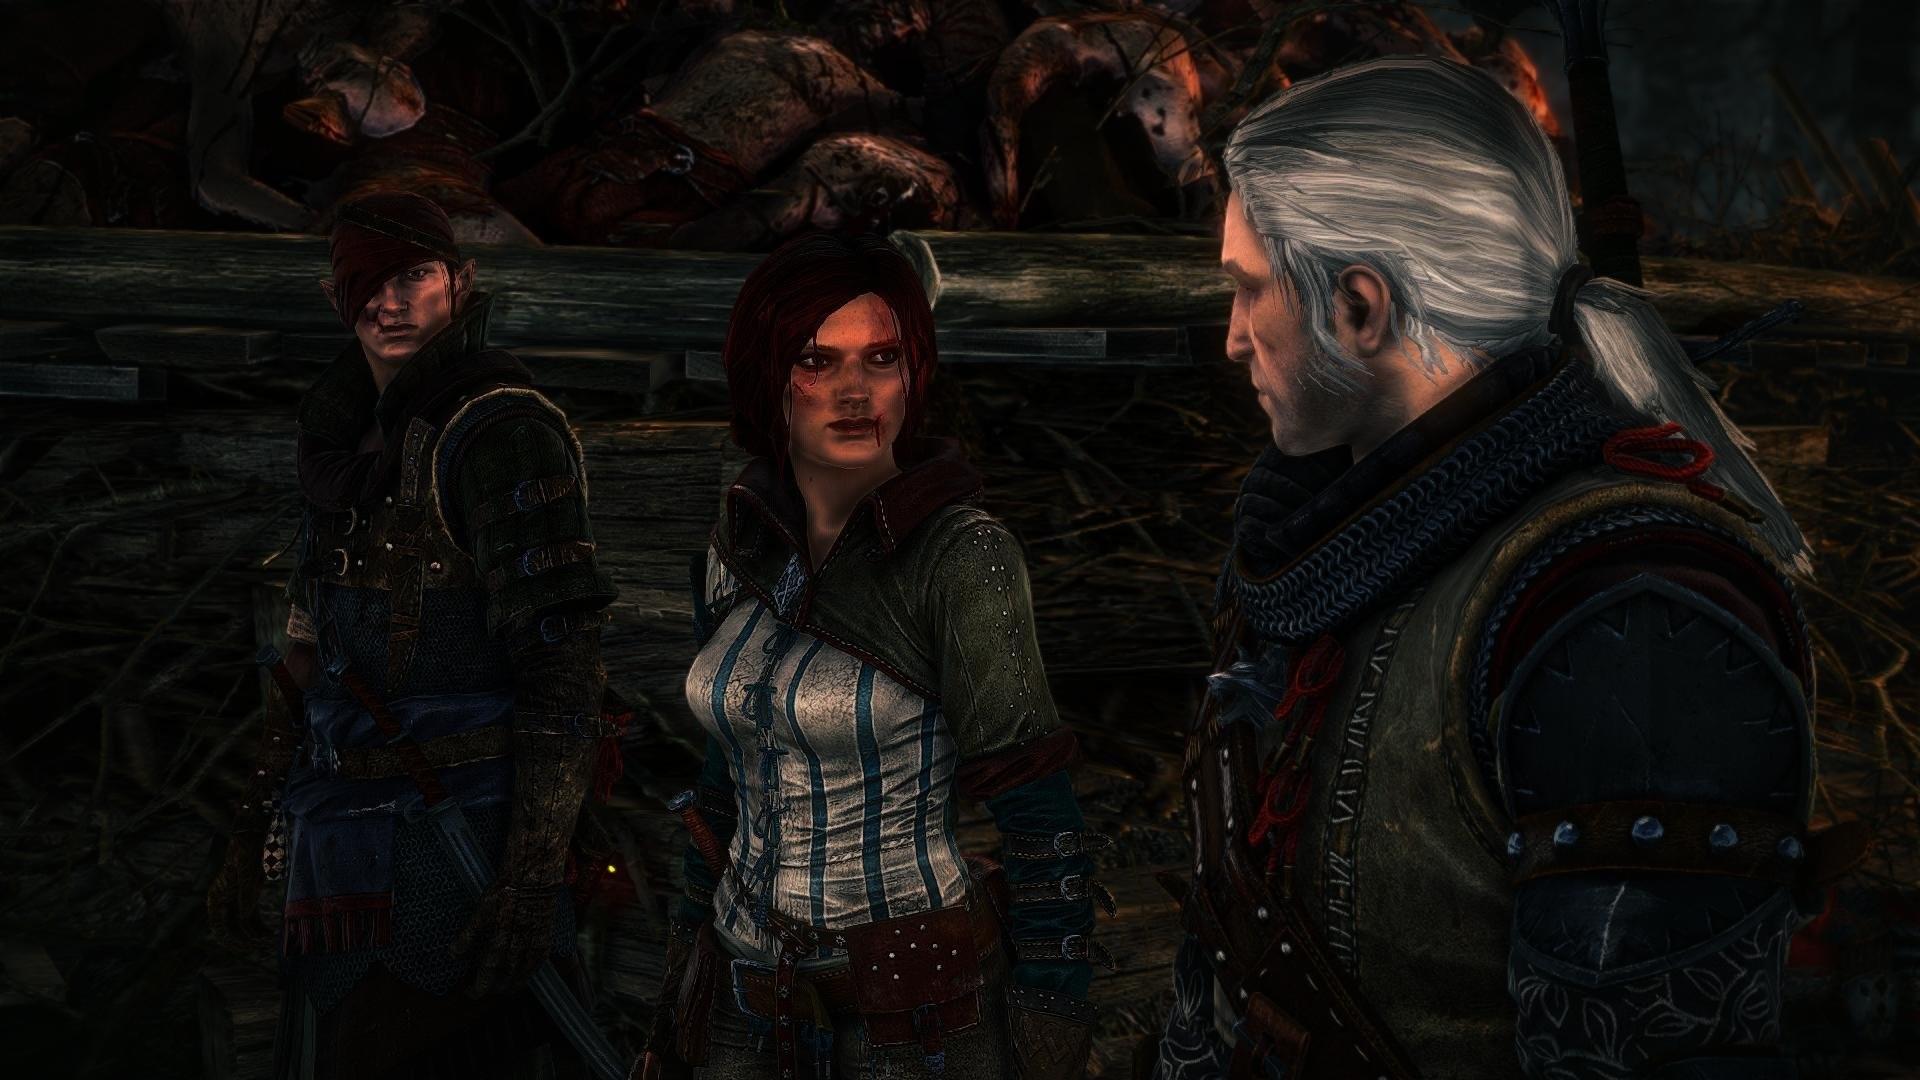 The Witcher 2 Assassins of Kings Geralt Triss Merigold Iorweth wallpaper